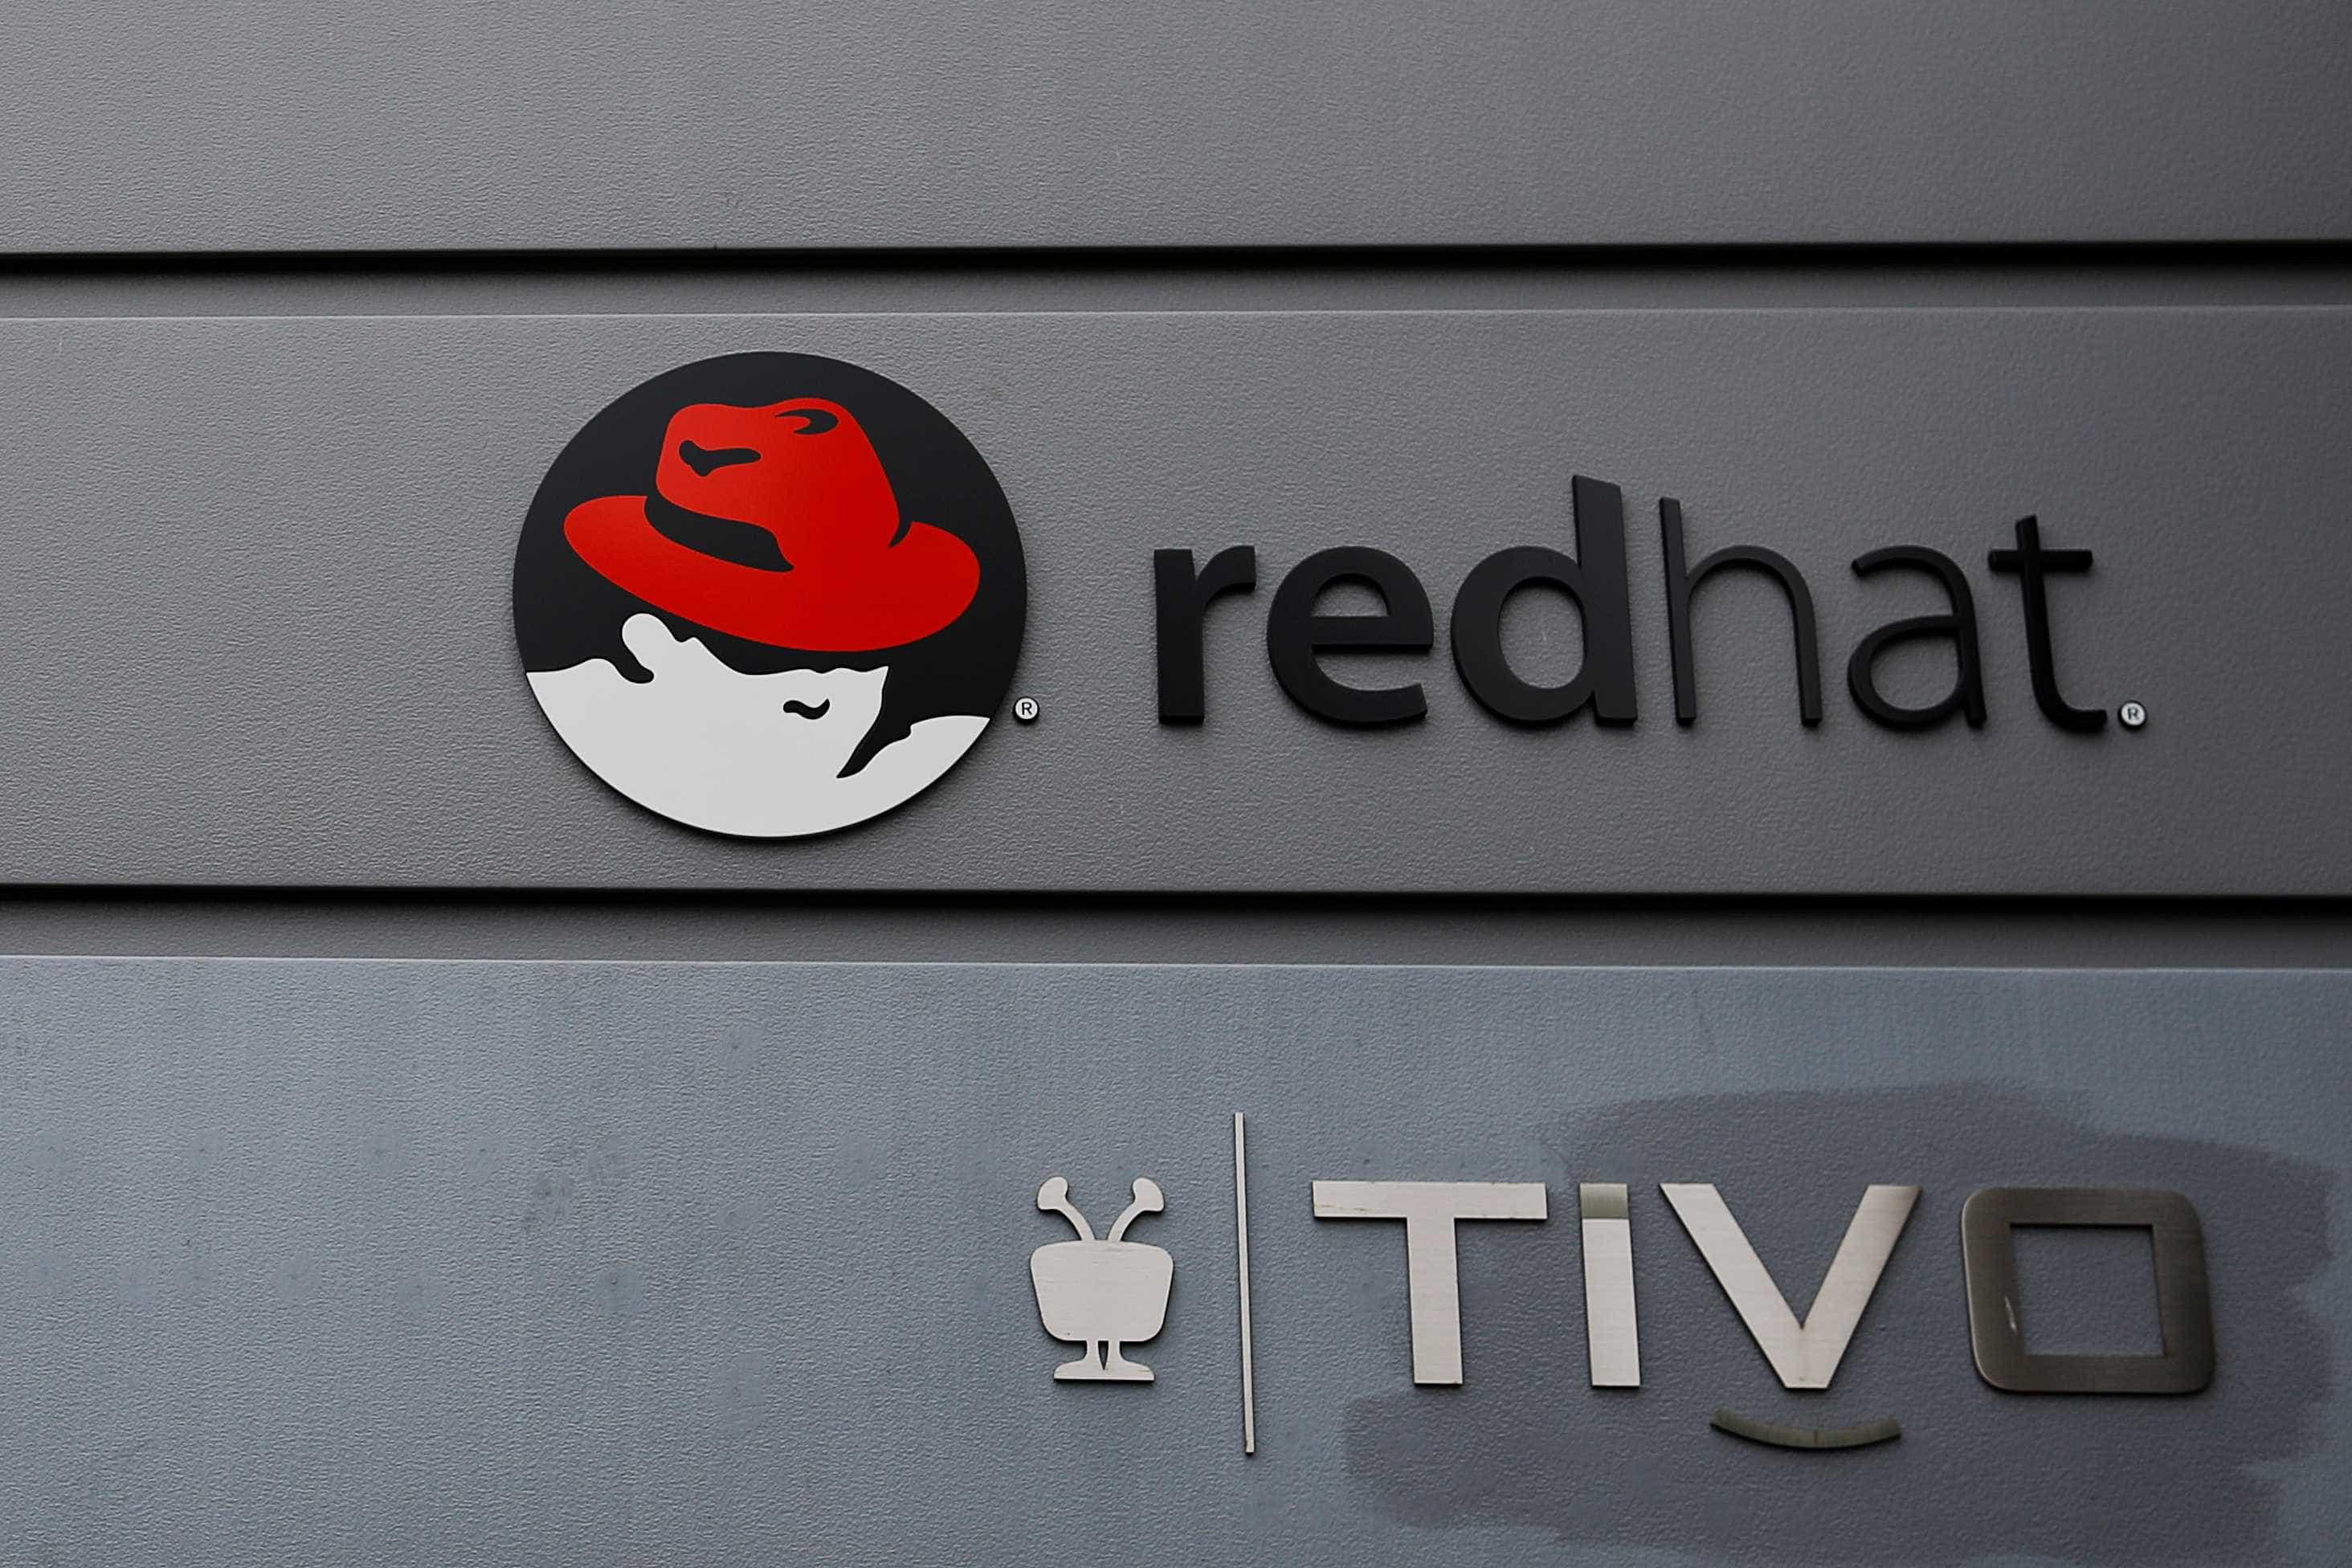 IBM anuncia compra de empresa de software Red Hat por US$ 34 bilhões